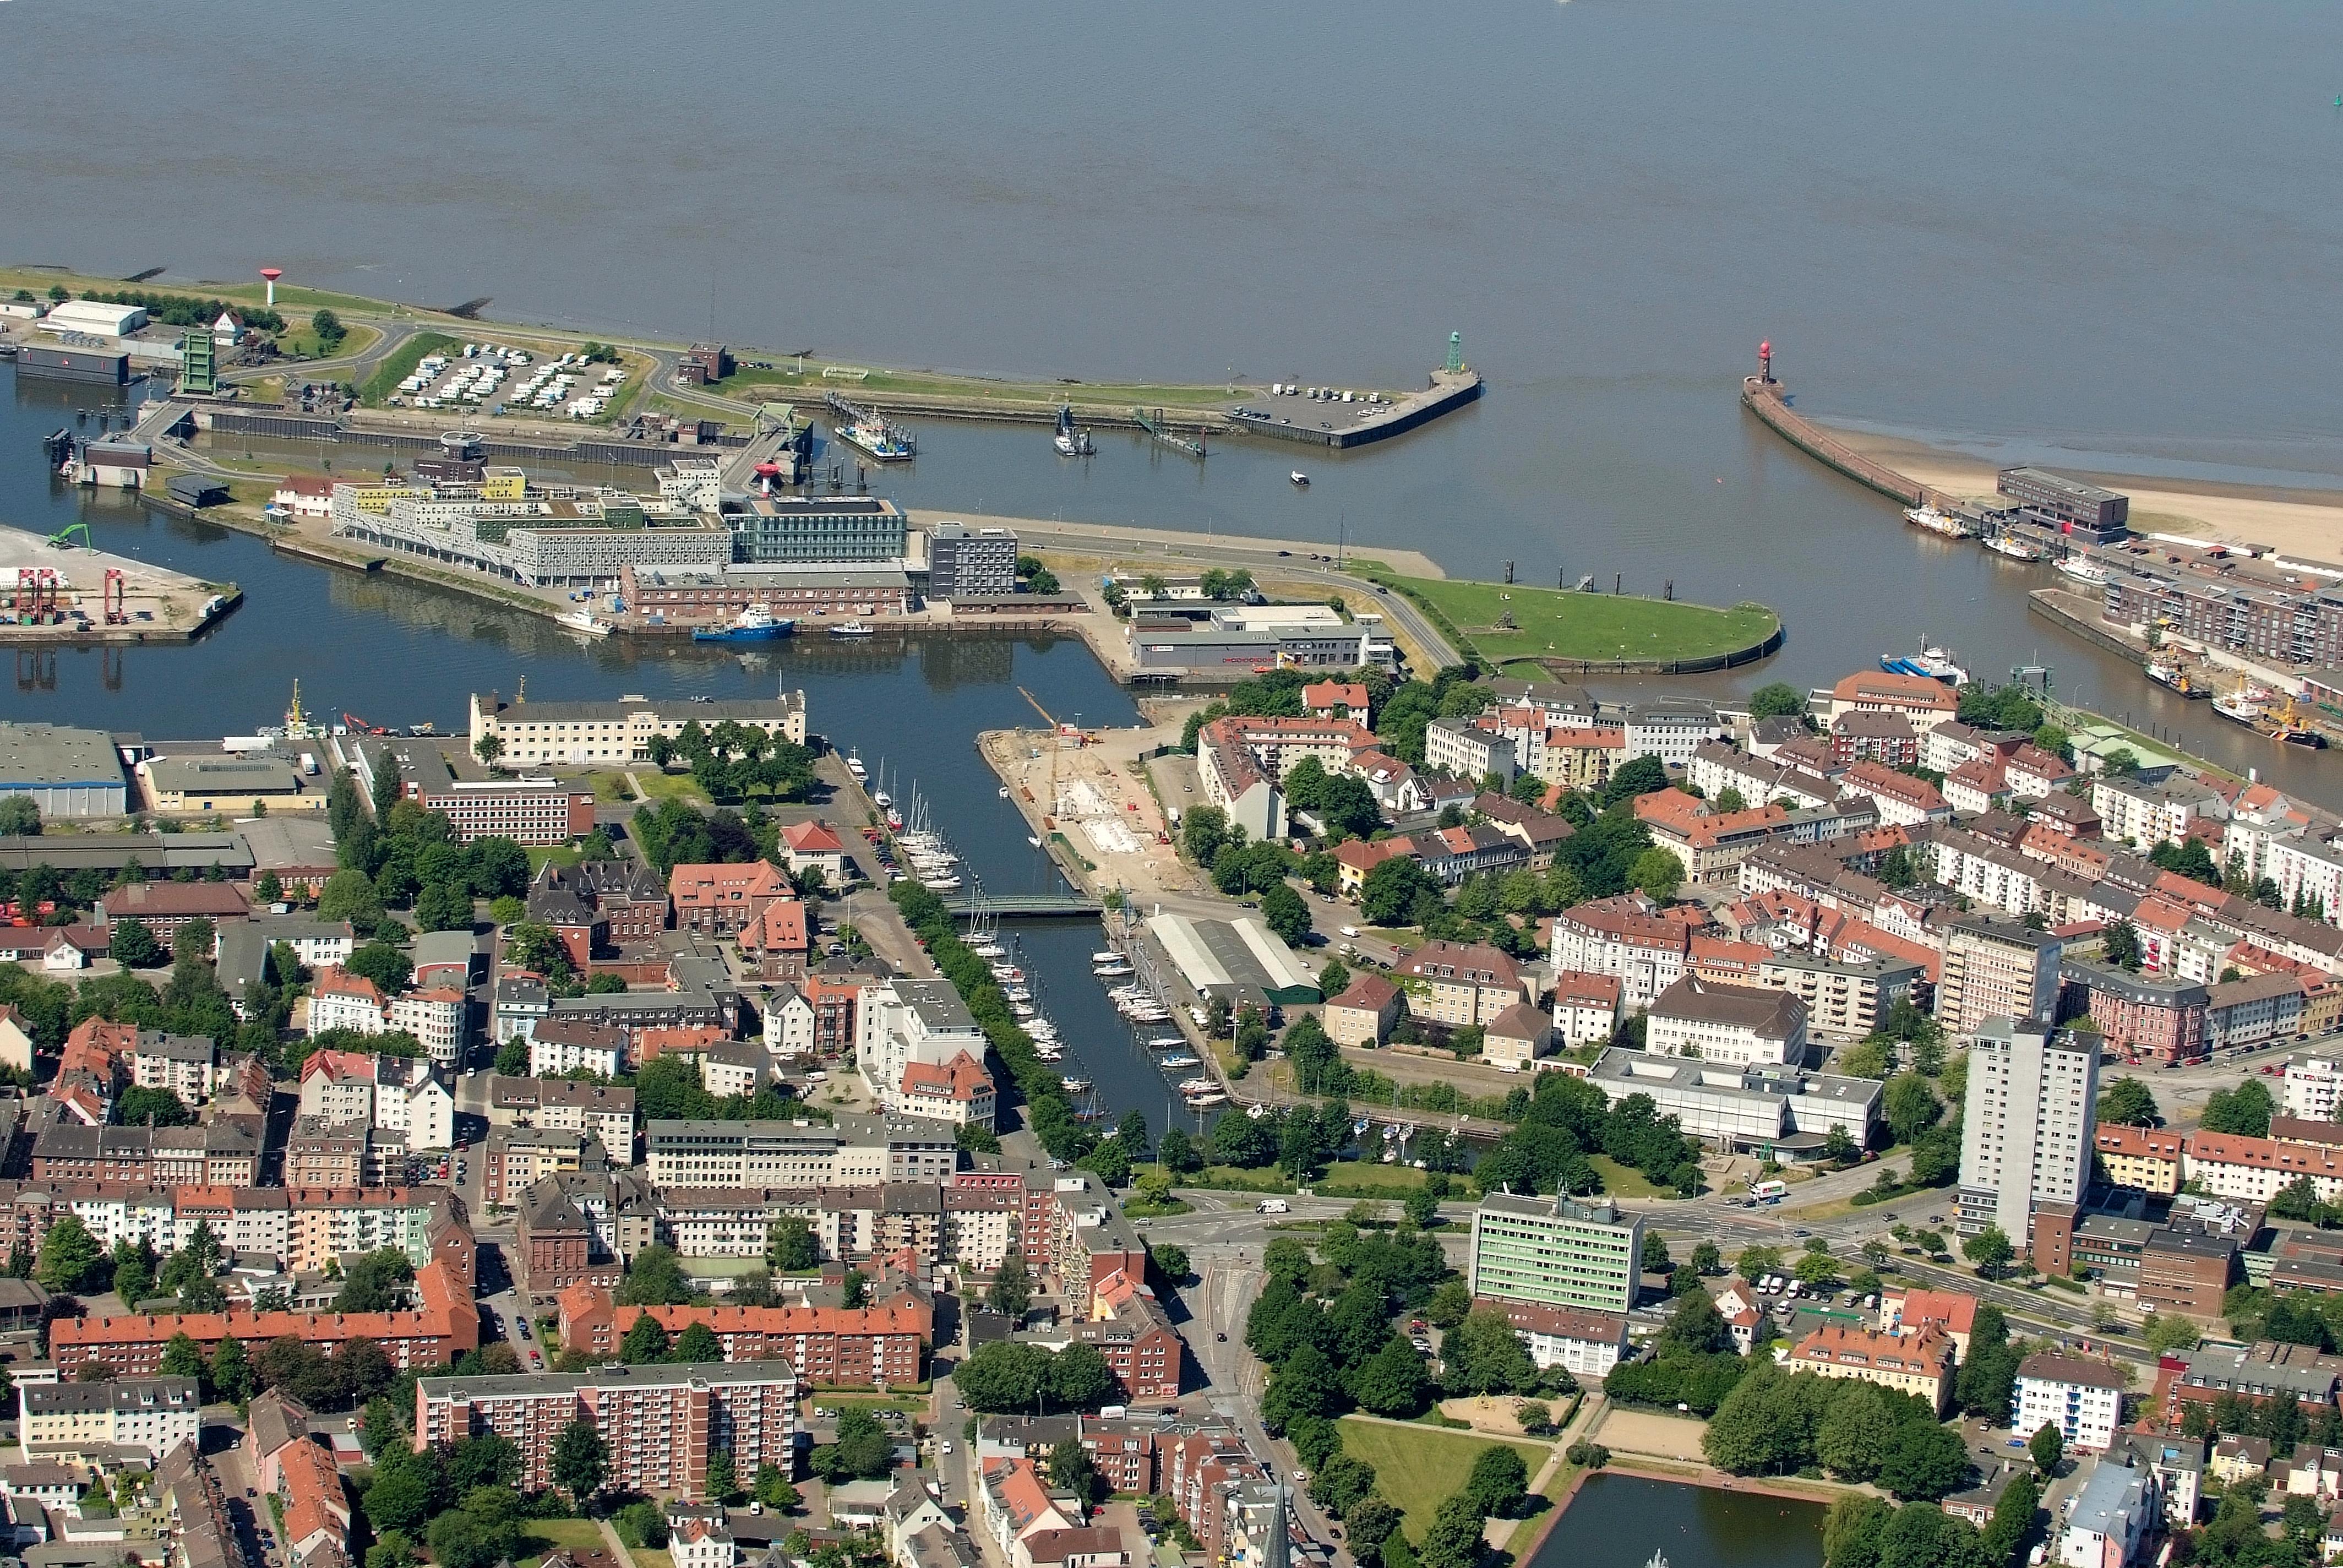 File:2012-05-28 Fotoflug Cuxhaven Wilhelmshaven DSCF9382.jpg ...